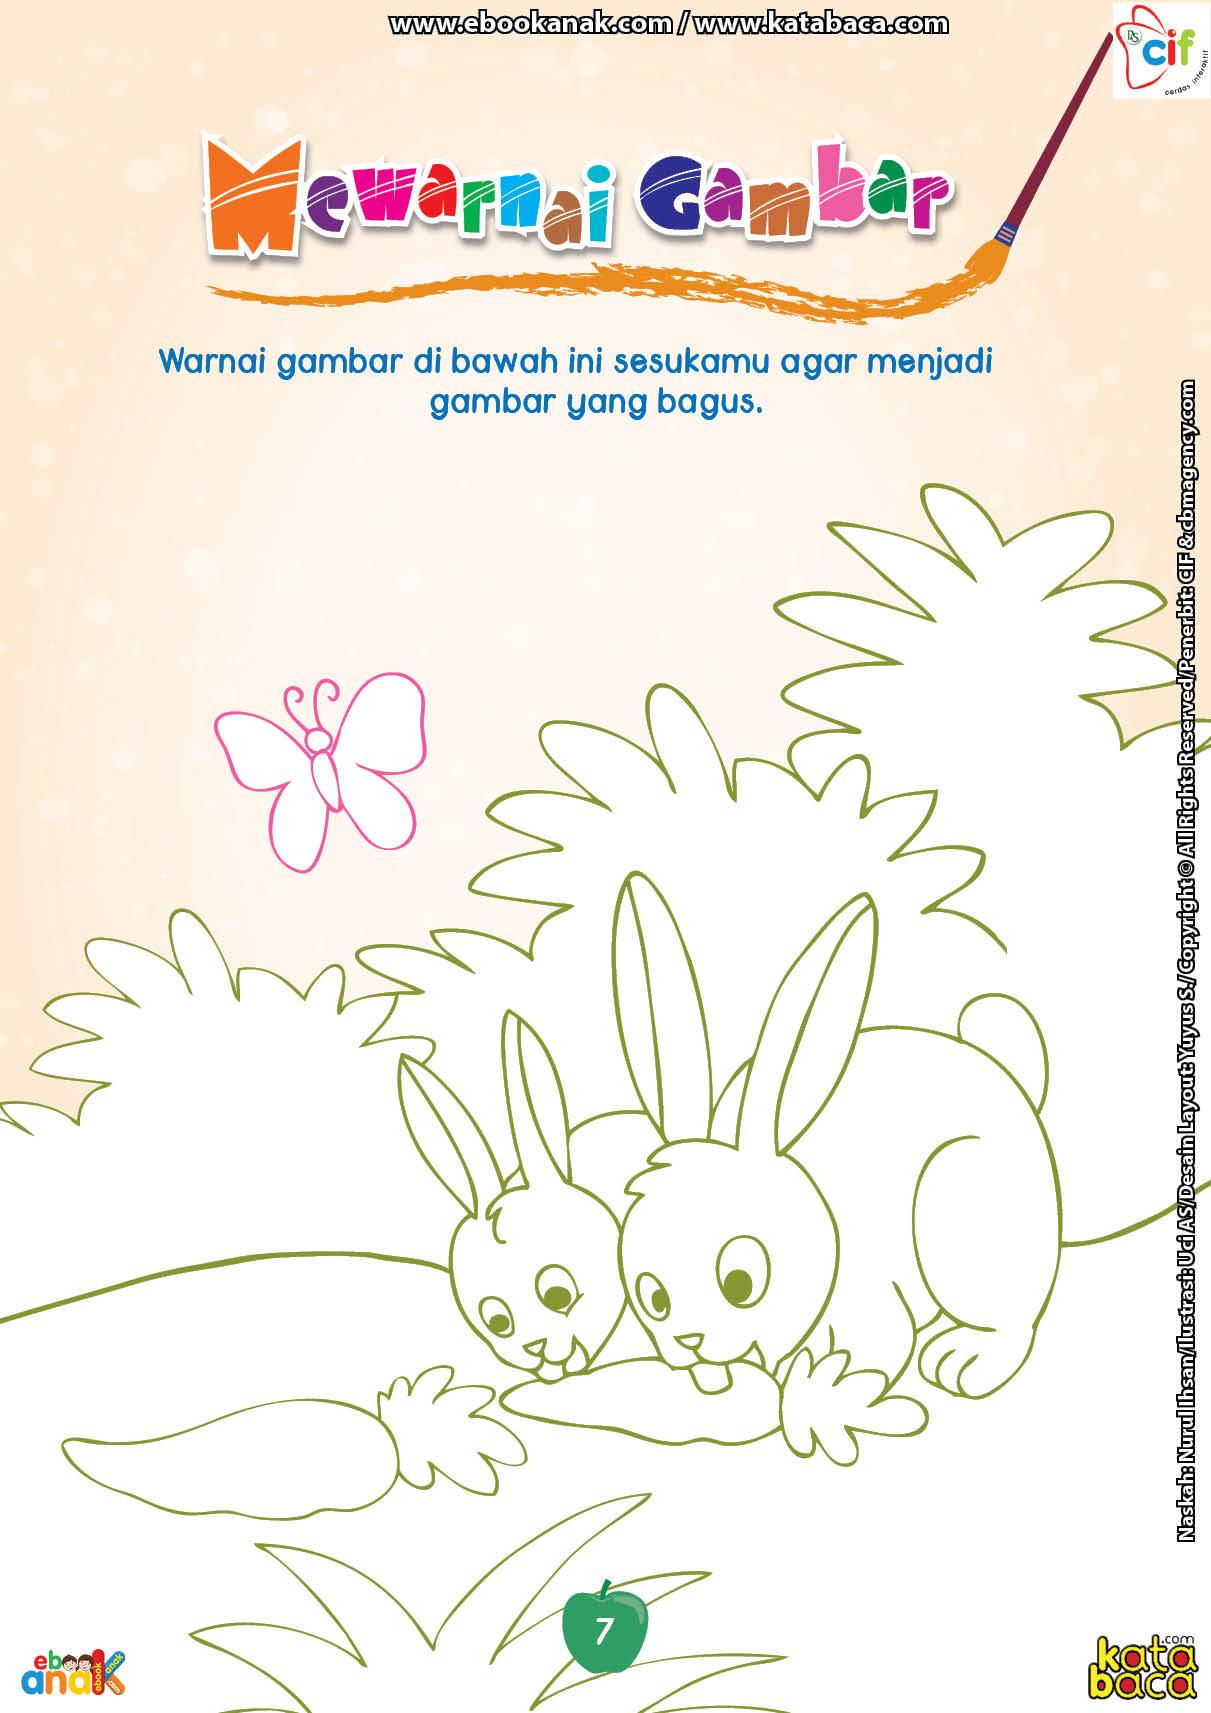 Mewarnai Gambar Dua Ekor Kelinci Yang Sedang Makan Wortel Ebook Anak